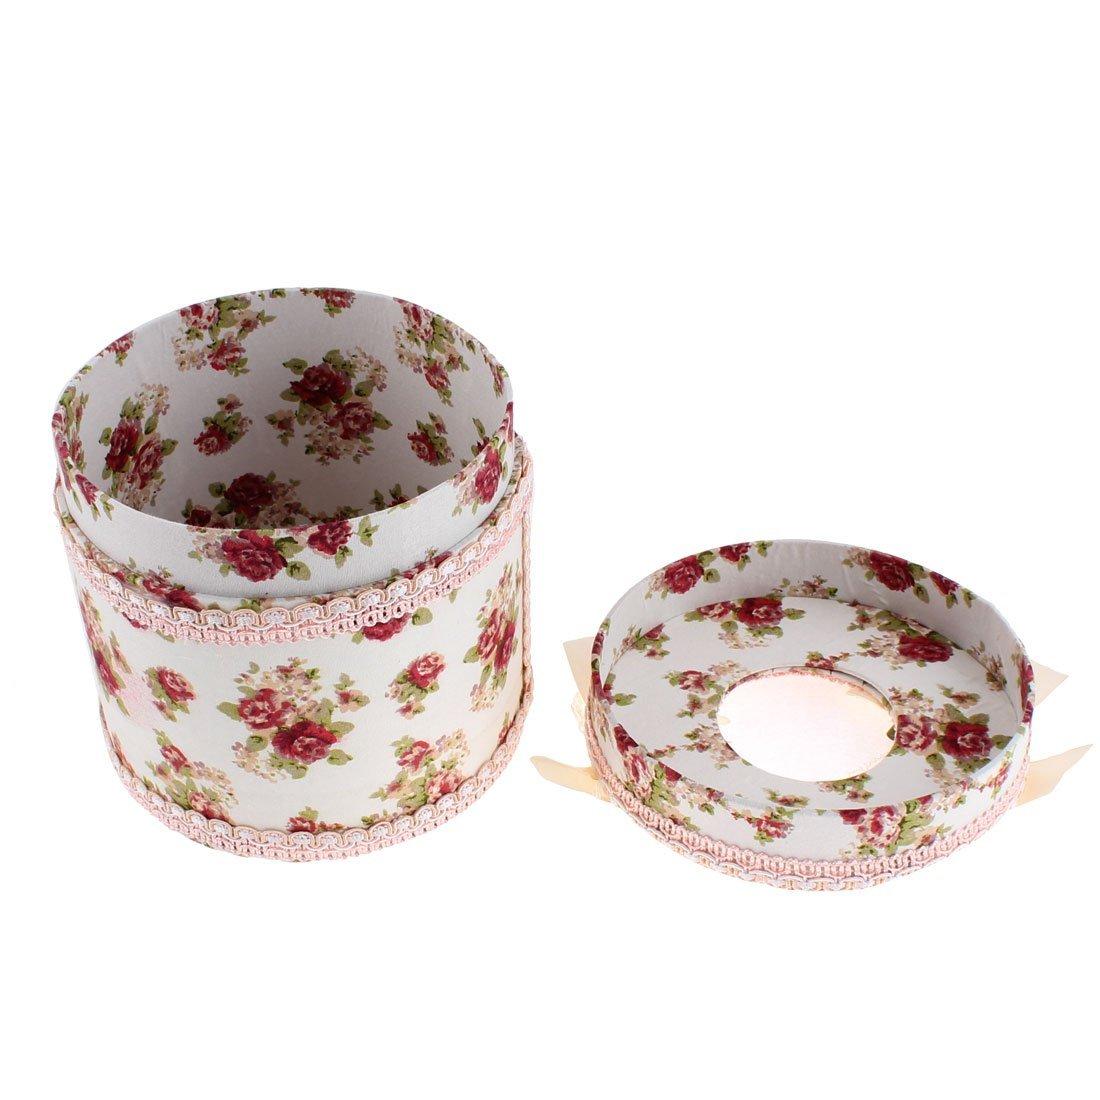 Amazon.com: eDealMax Patrón Flor de Forma Redonda Caso del Tejido cuadro Titular: Home & Kitchen